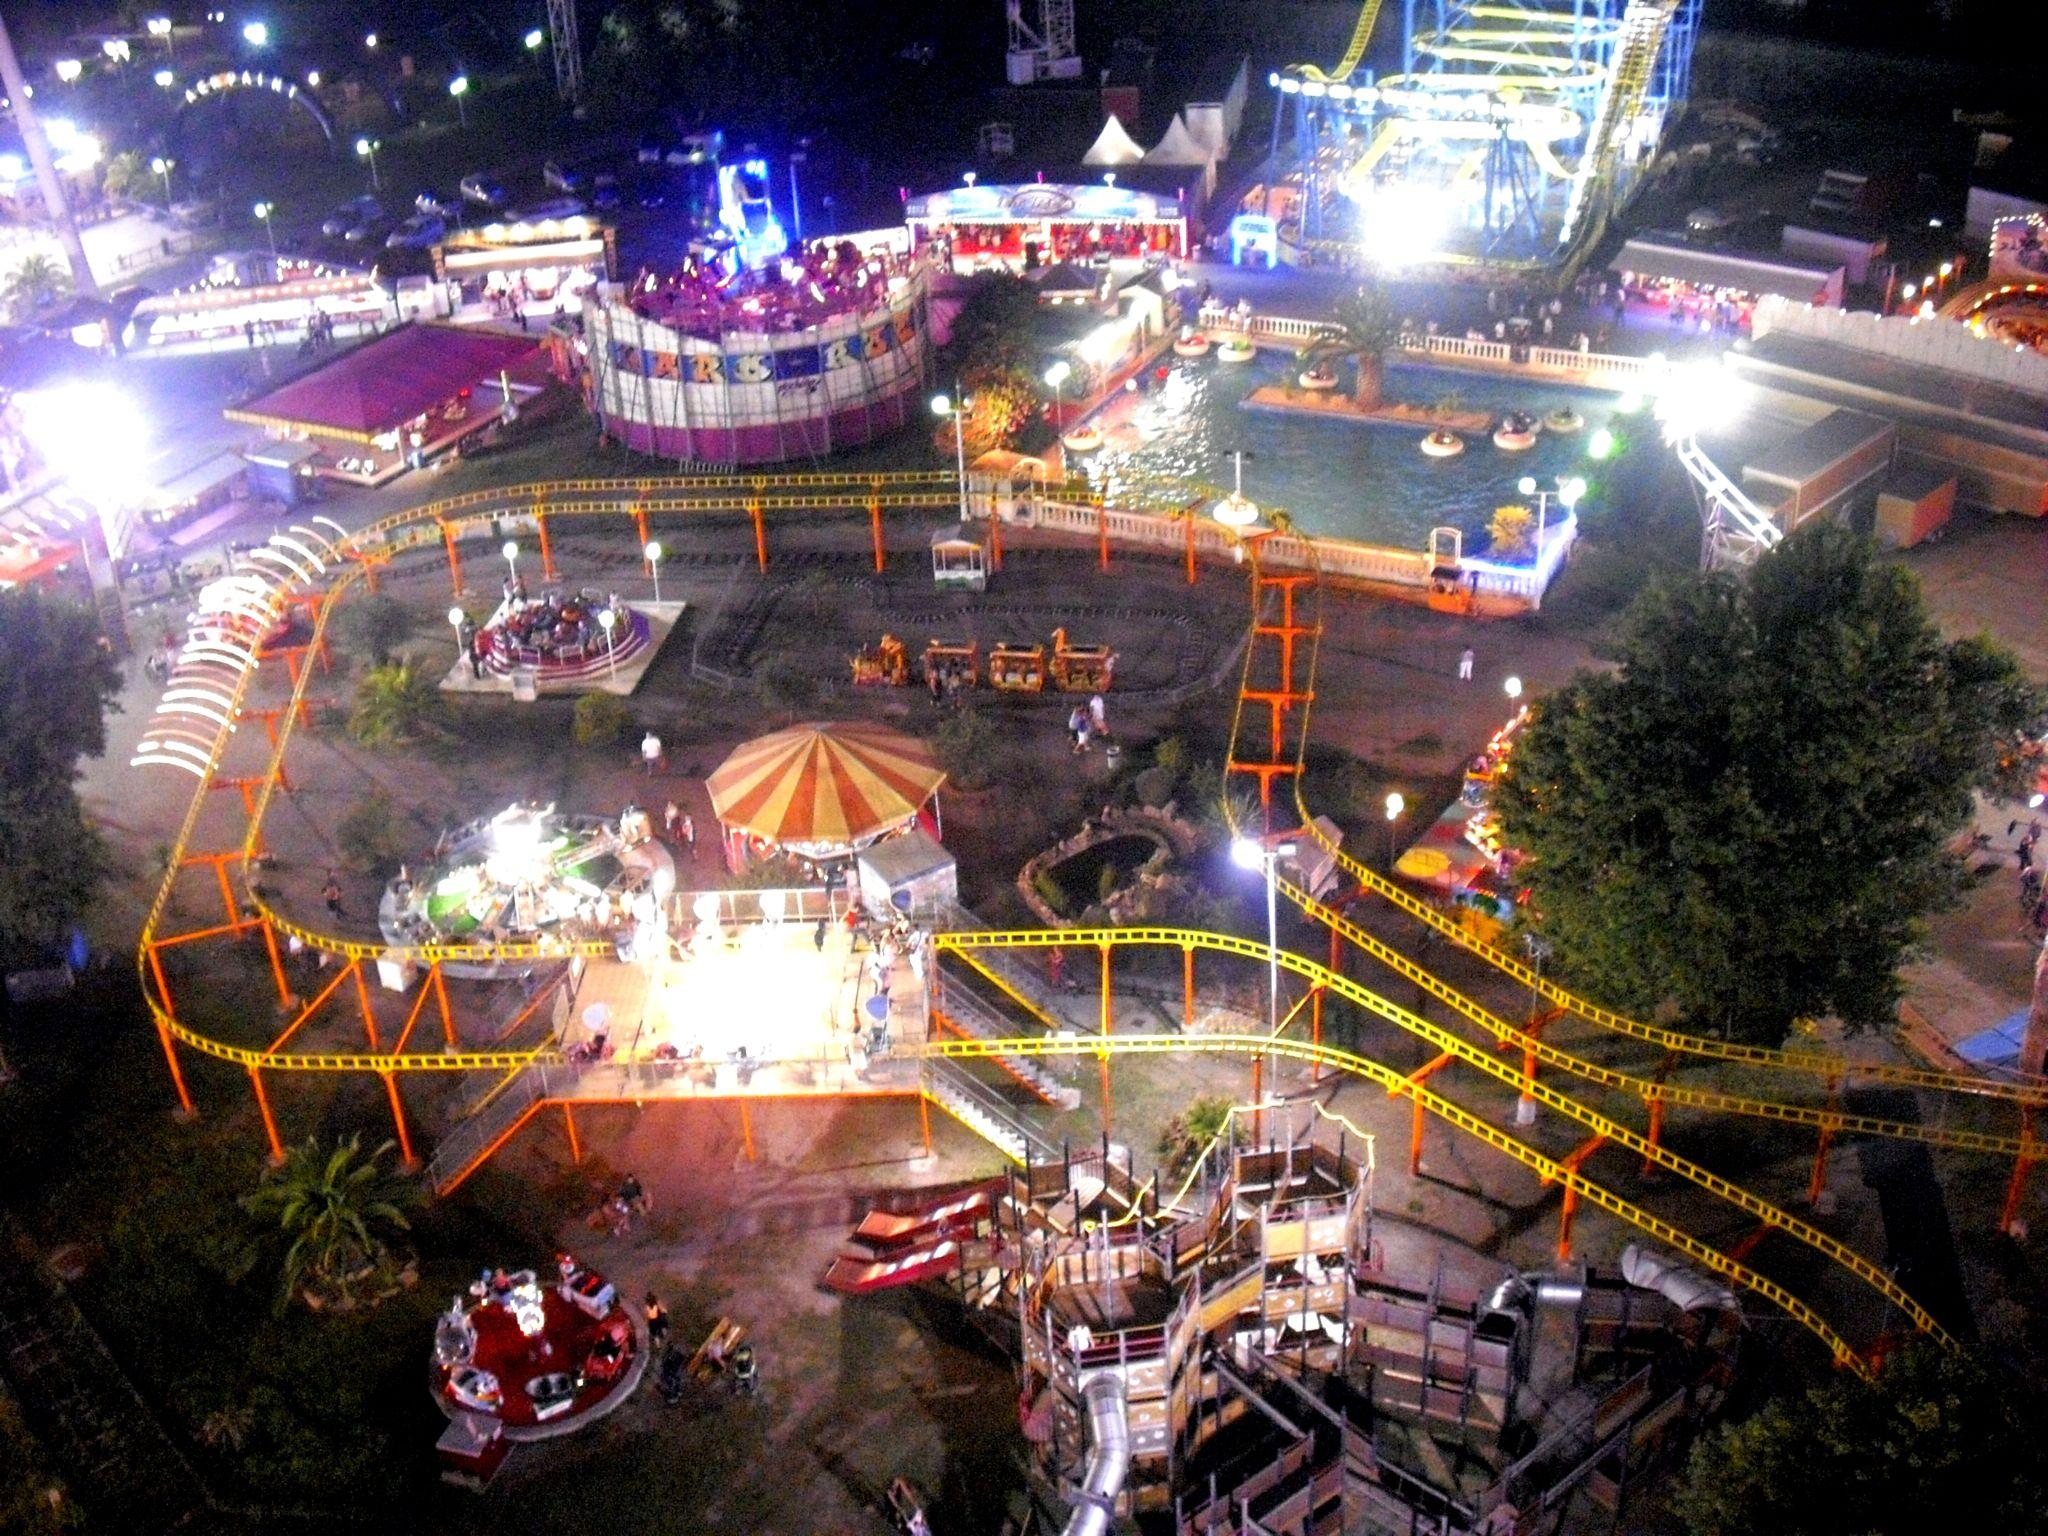 Luna Park de Fréjus by Blueanna